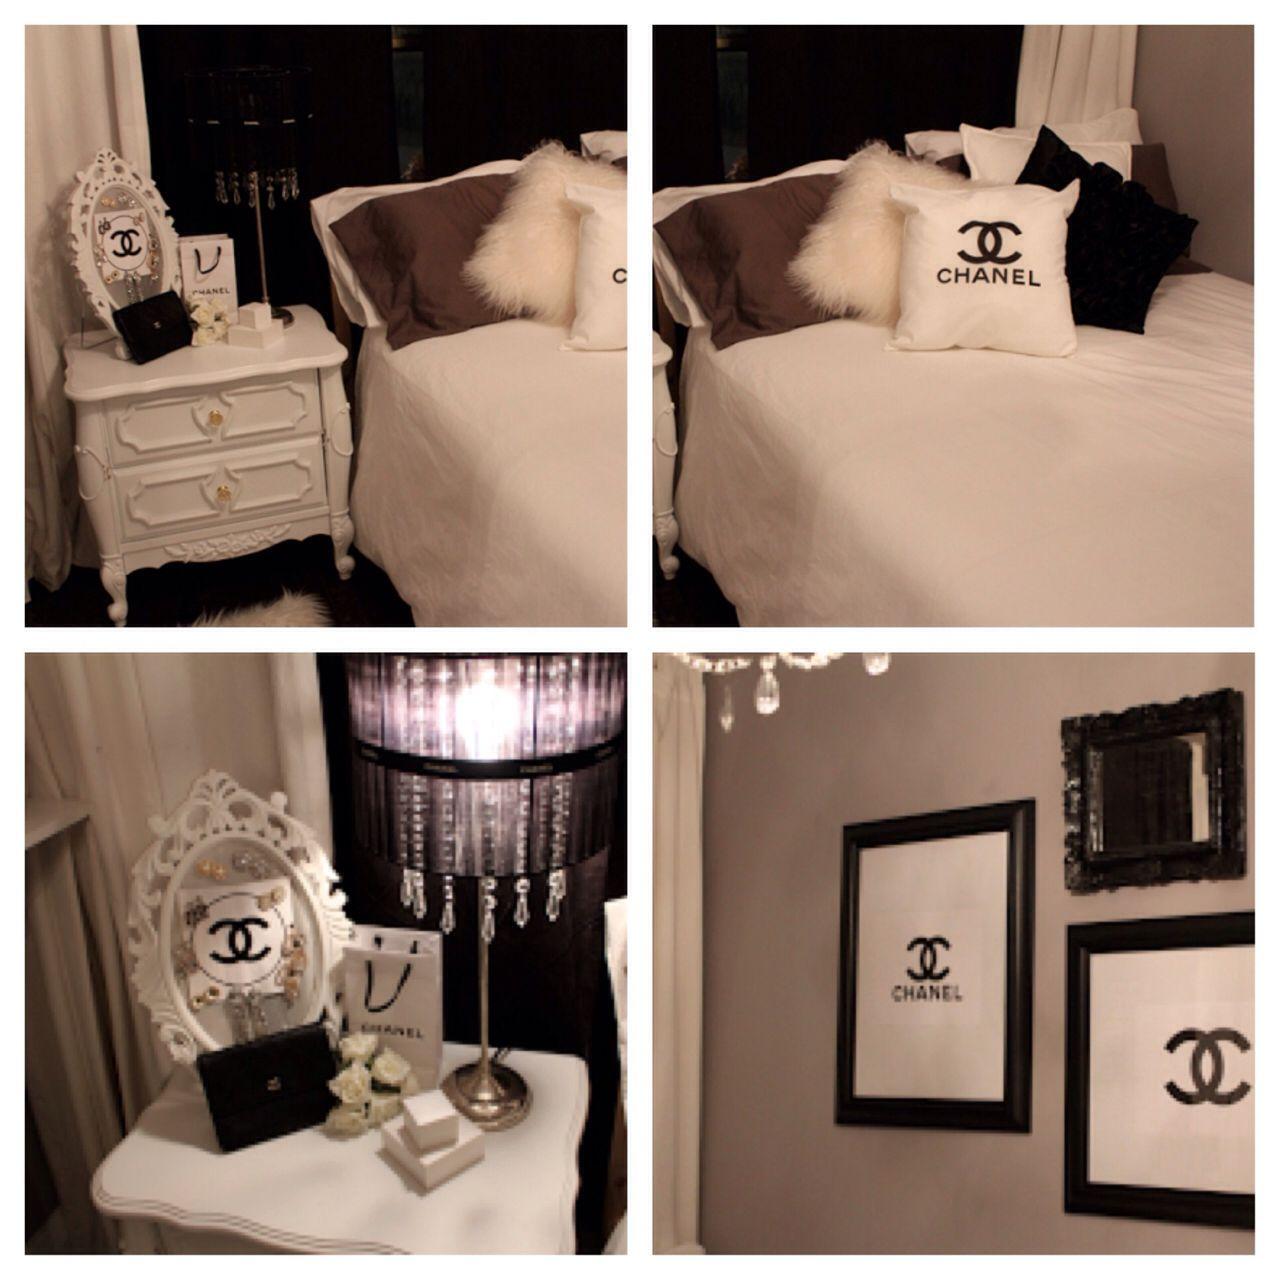 Chanel Inspiration Chanel Inspired Room Apartment Decor Home Decor Inspiration